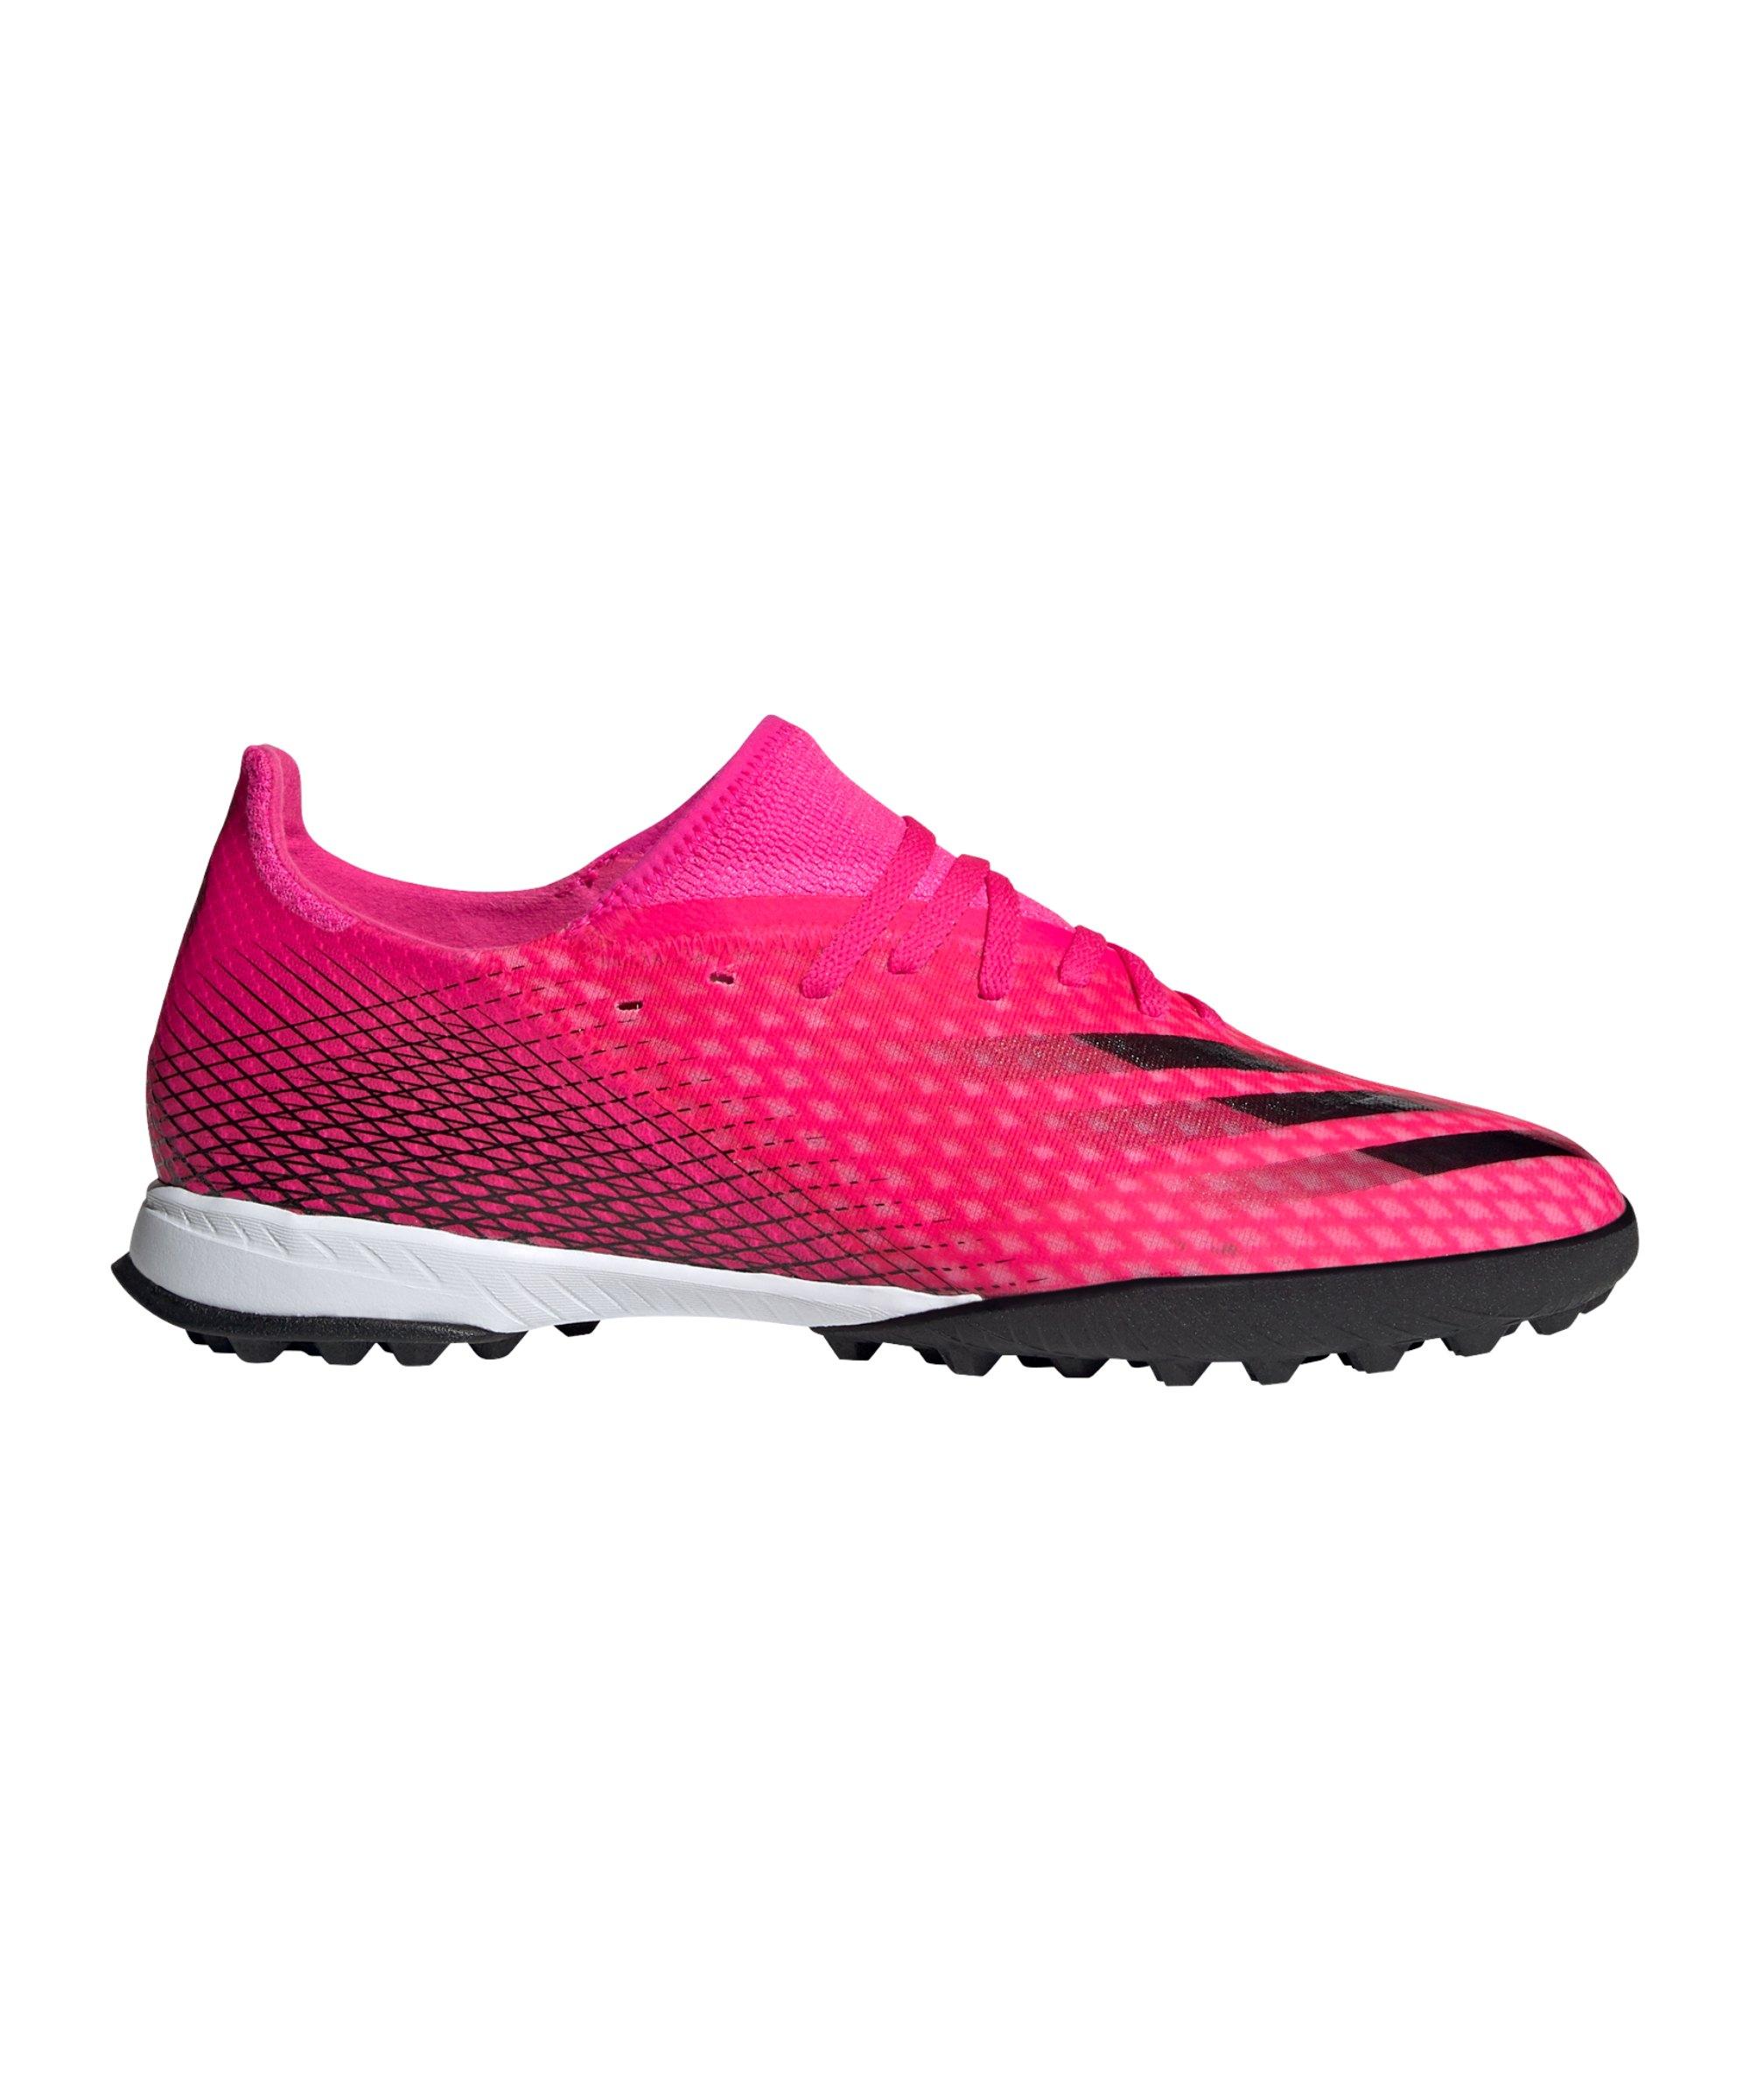 adidas X GHOSTED.3 TF Superspectral Pink Schwarz Orange - pink